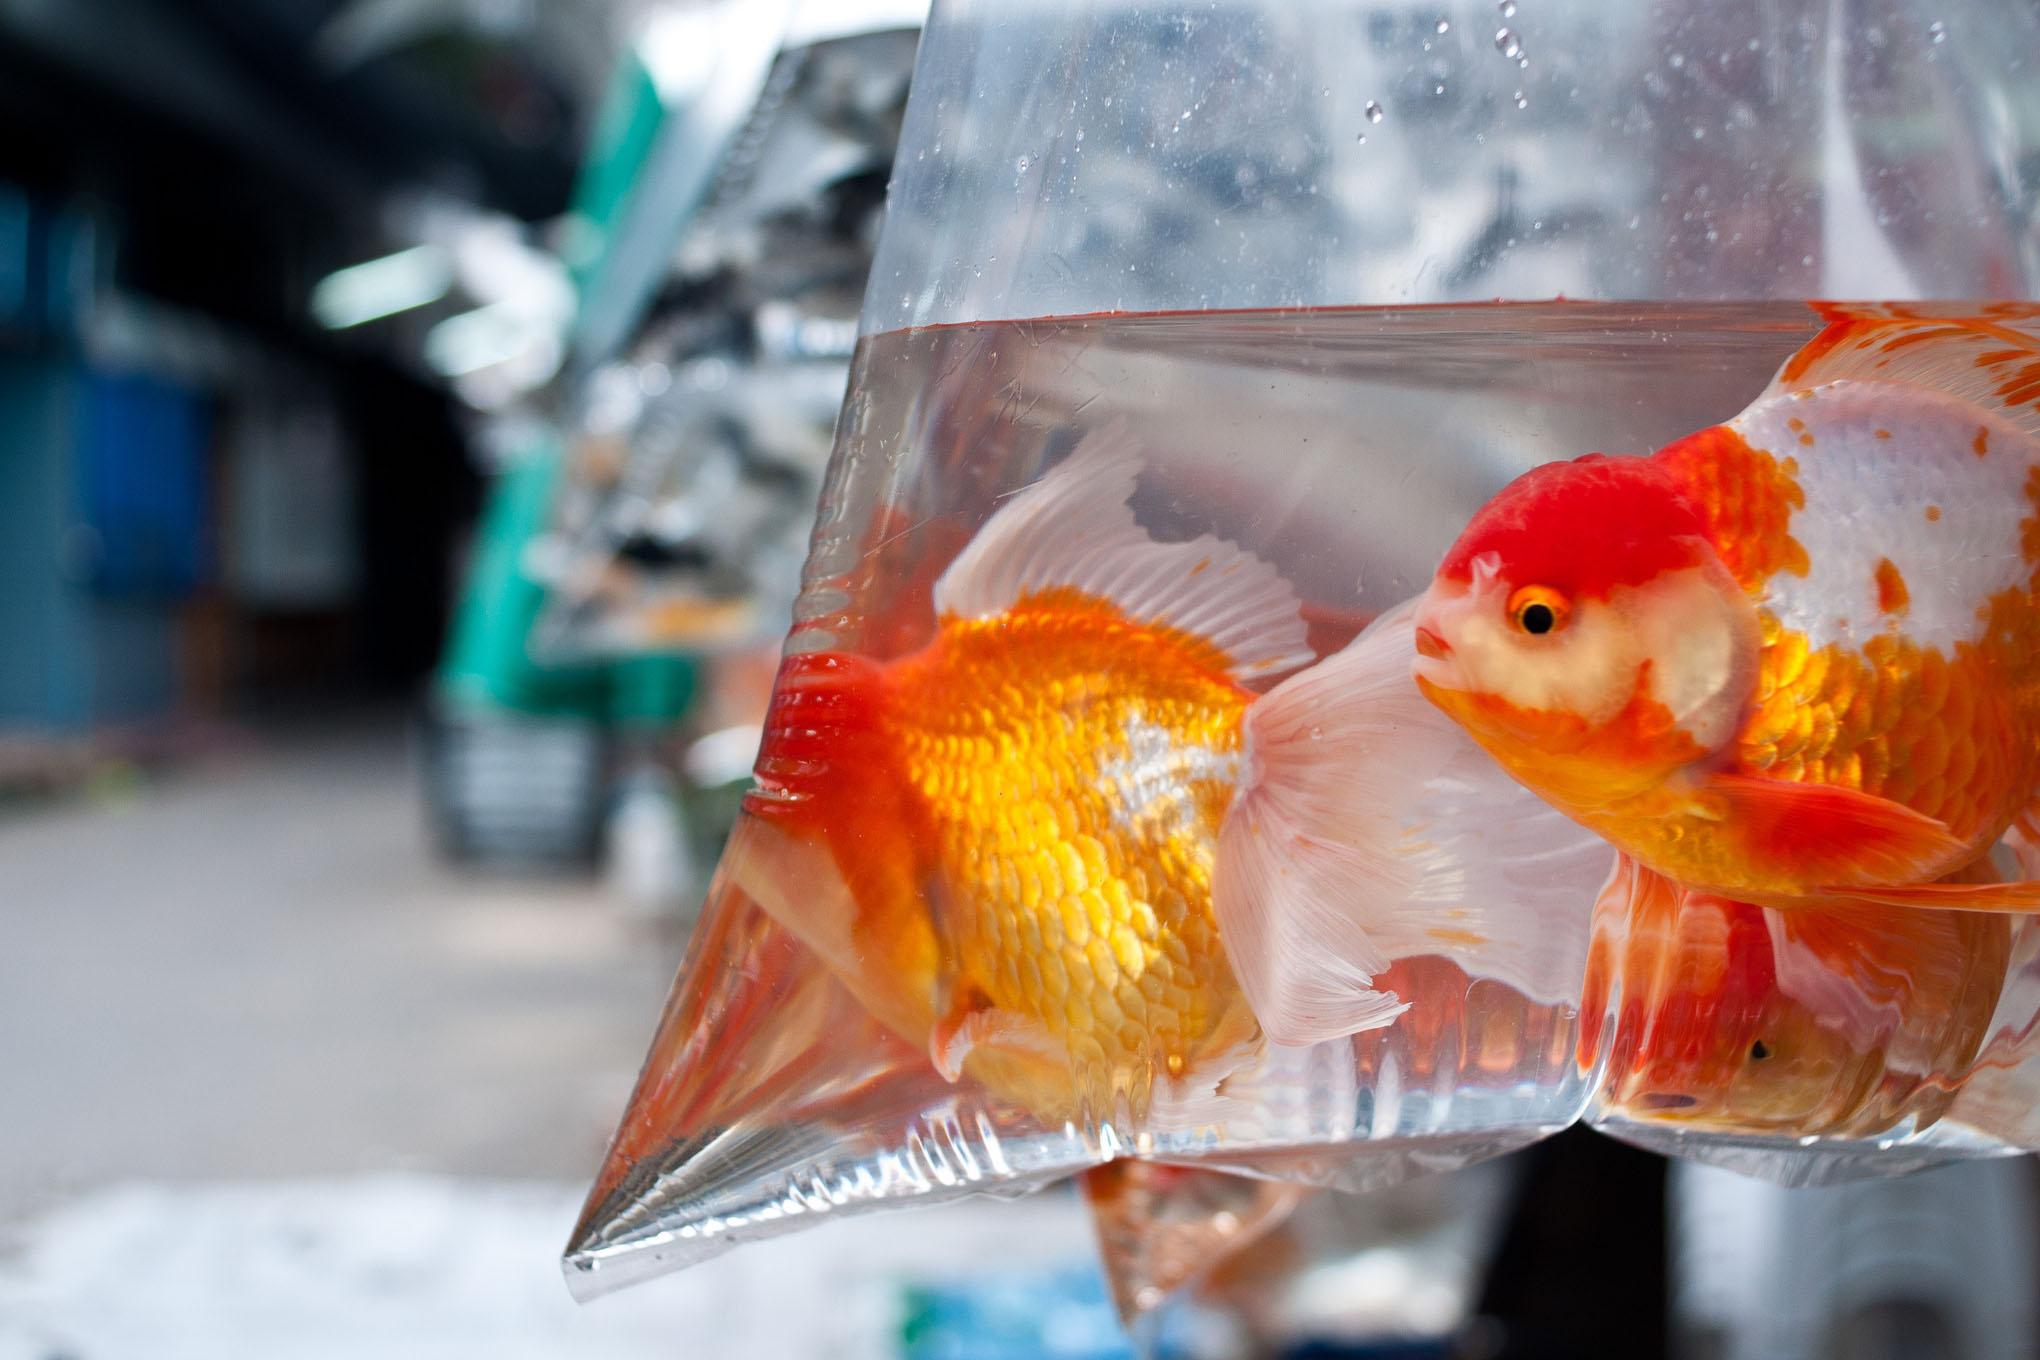 goldfish in a plastic bag